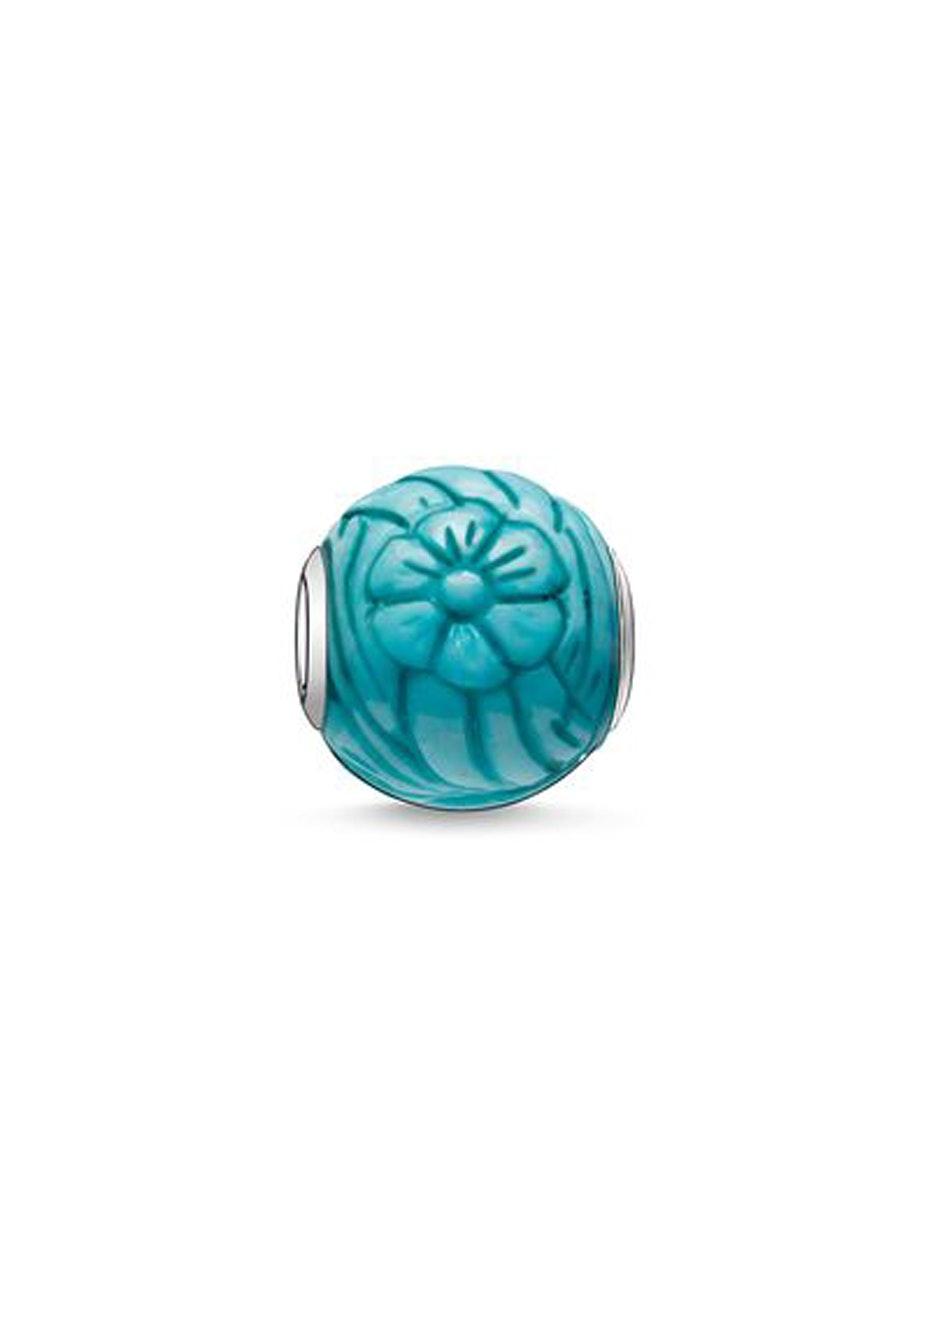 Thomas Sabo  - Karma Bead - Blue Carved Flower